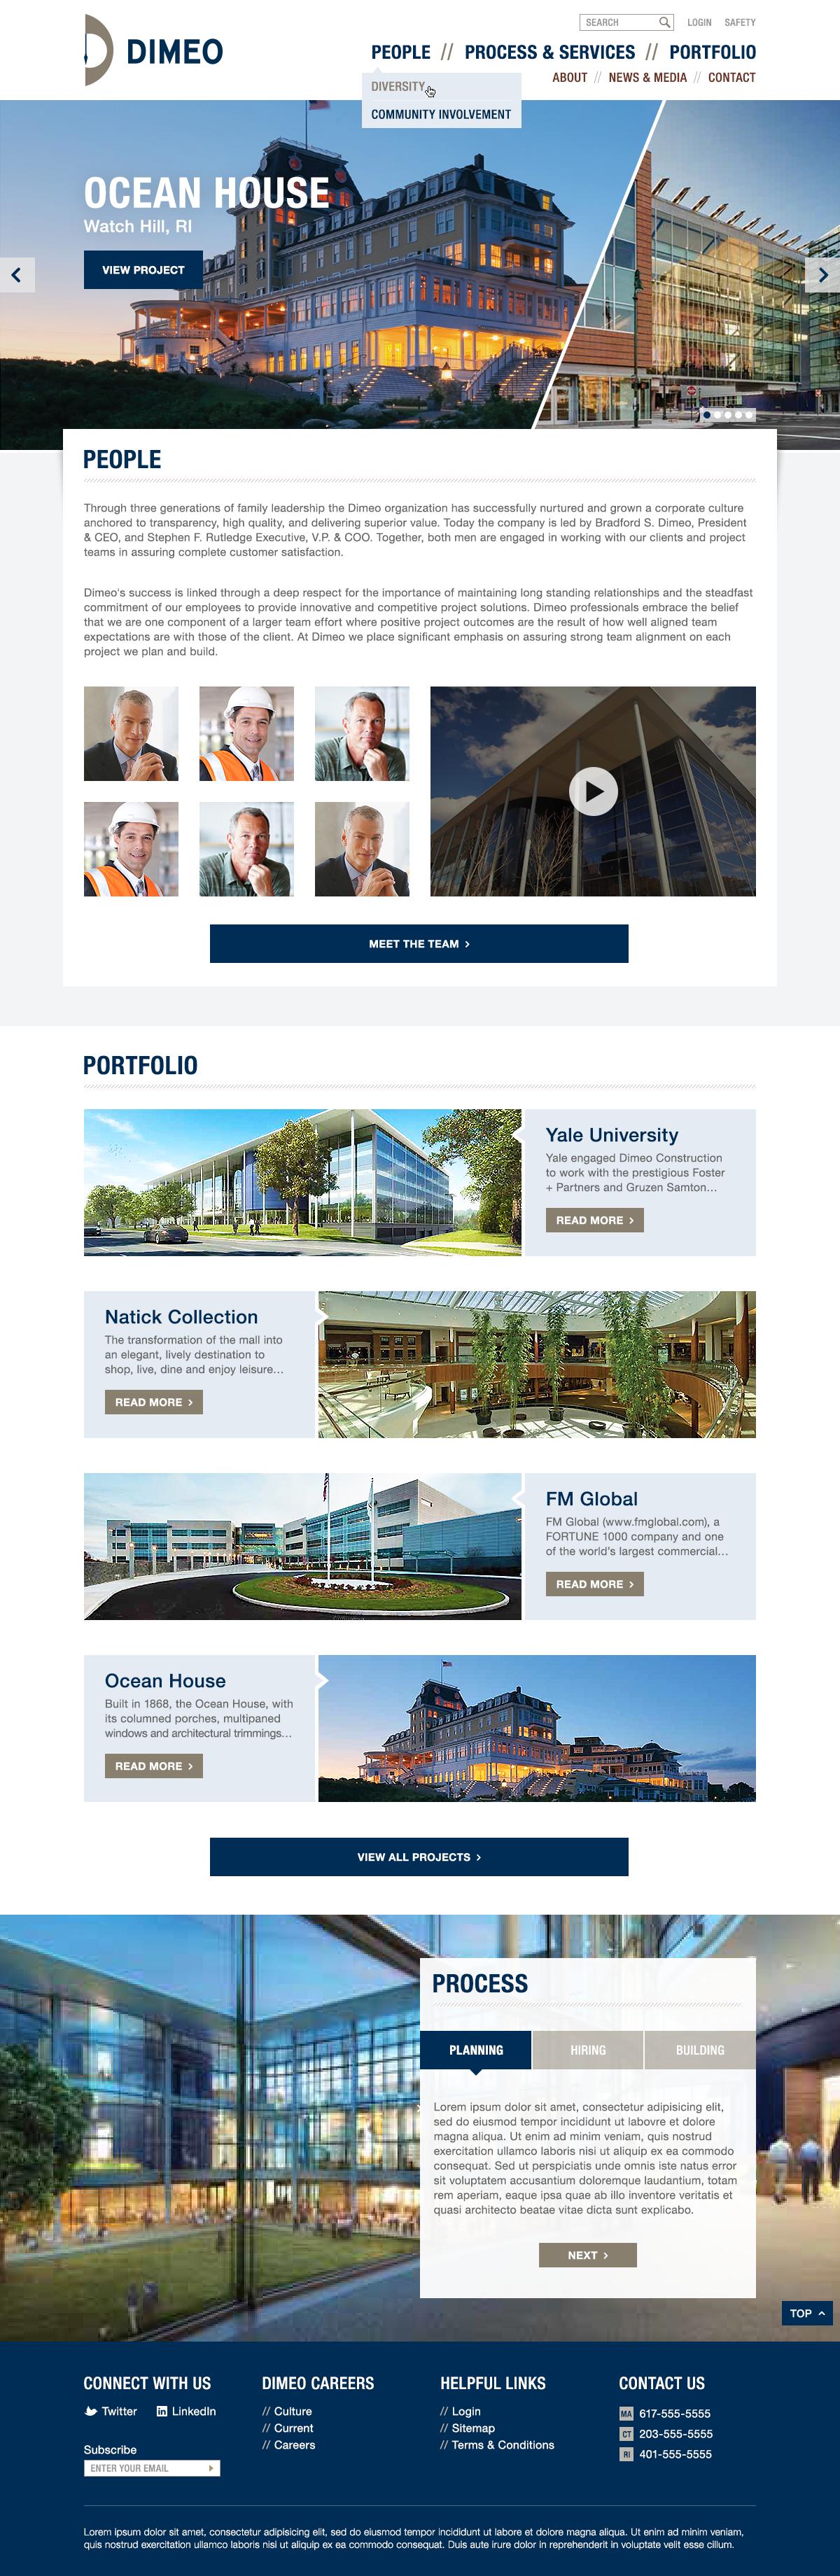 dimeo_web_1_homepage_v4-FINAL.png